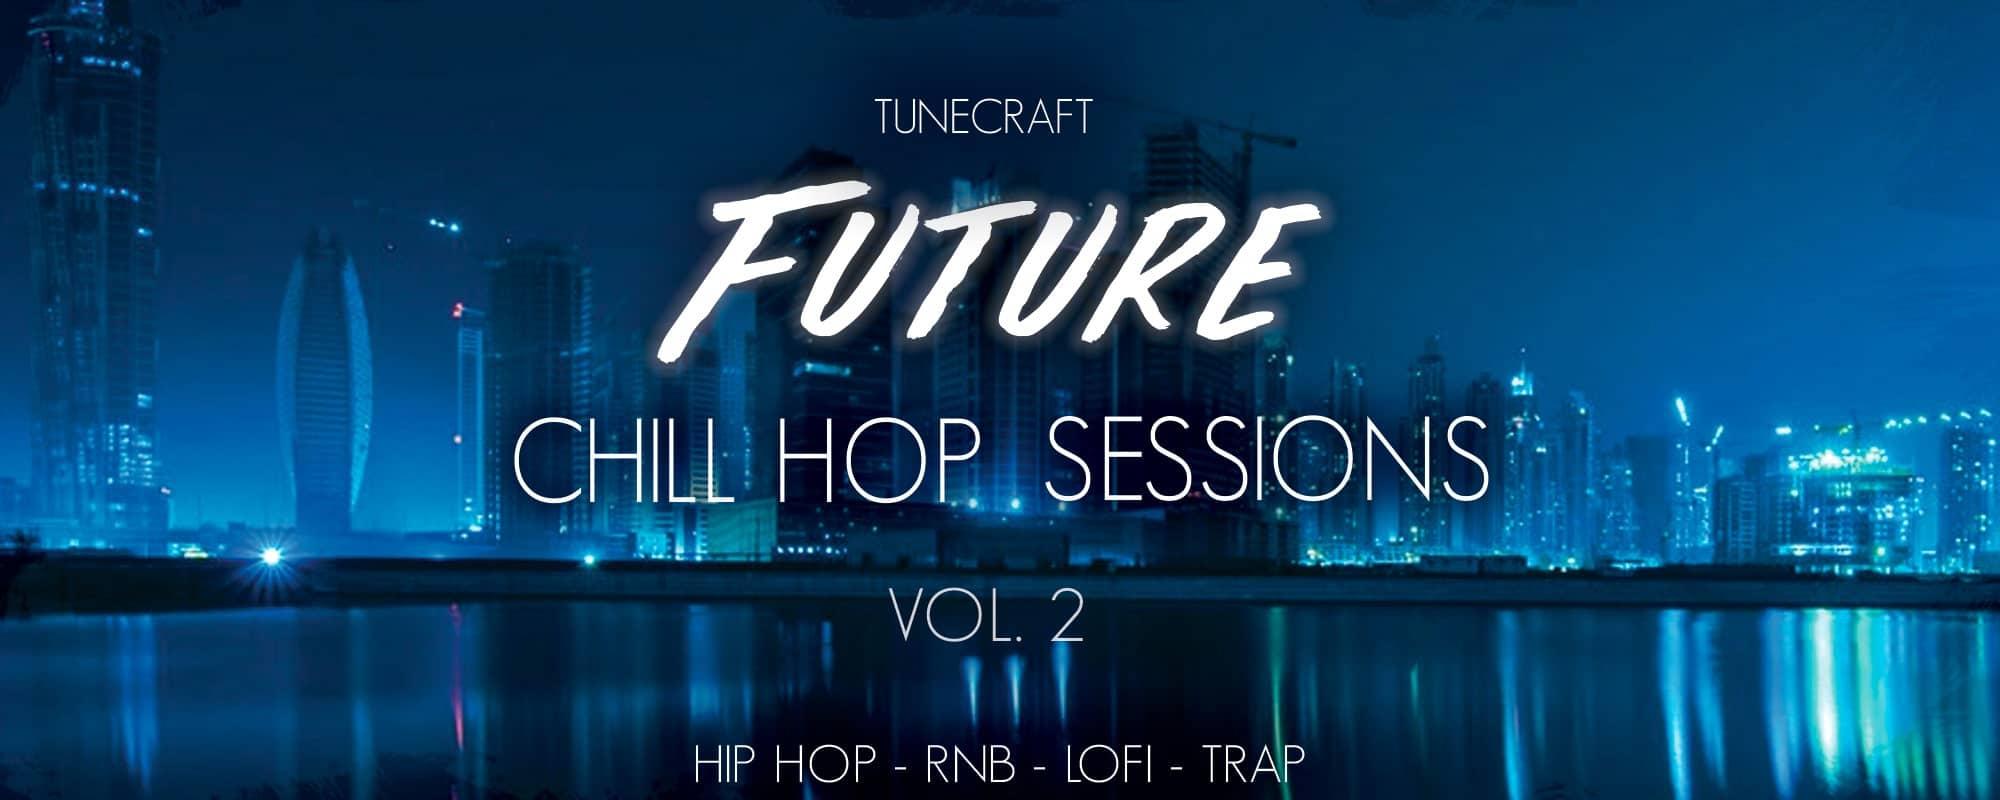 Future-Chill-Hop-Sessions-v2-1200x480-min